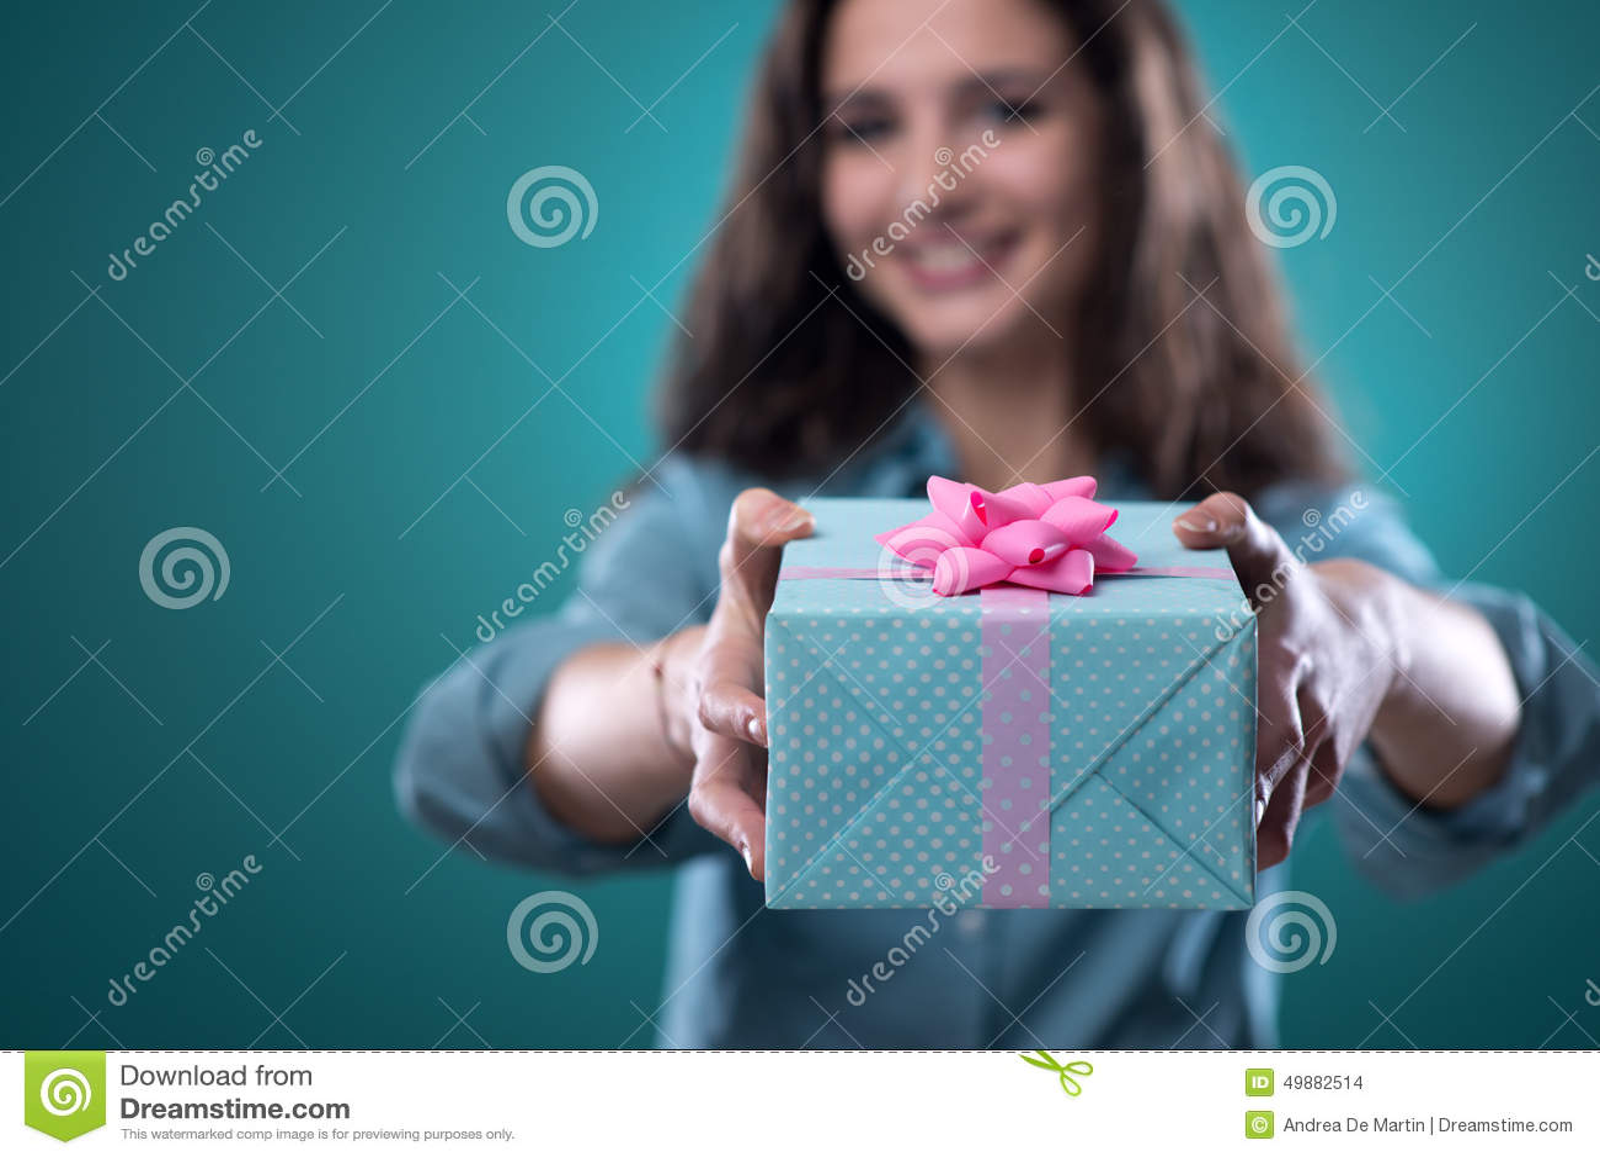 Как дарить подарки девушке? - allWomens